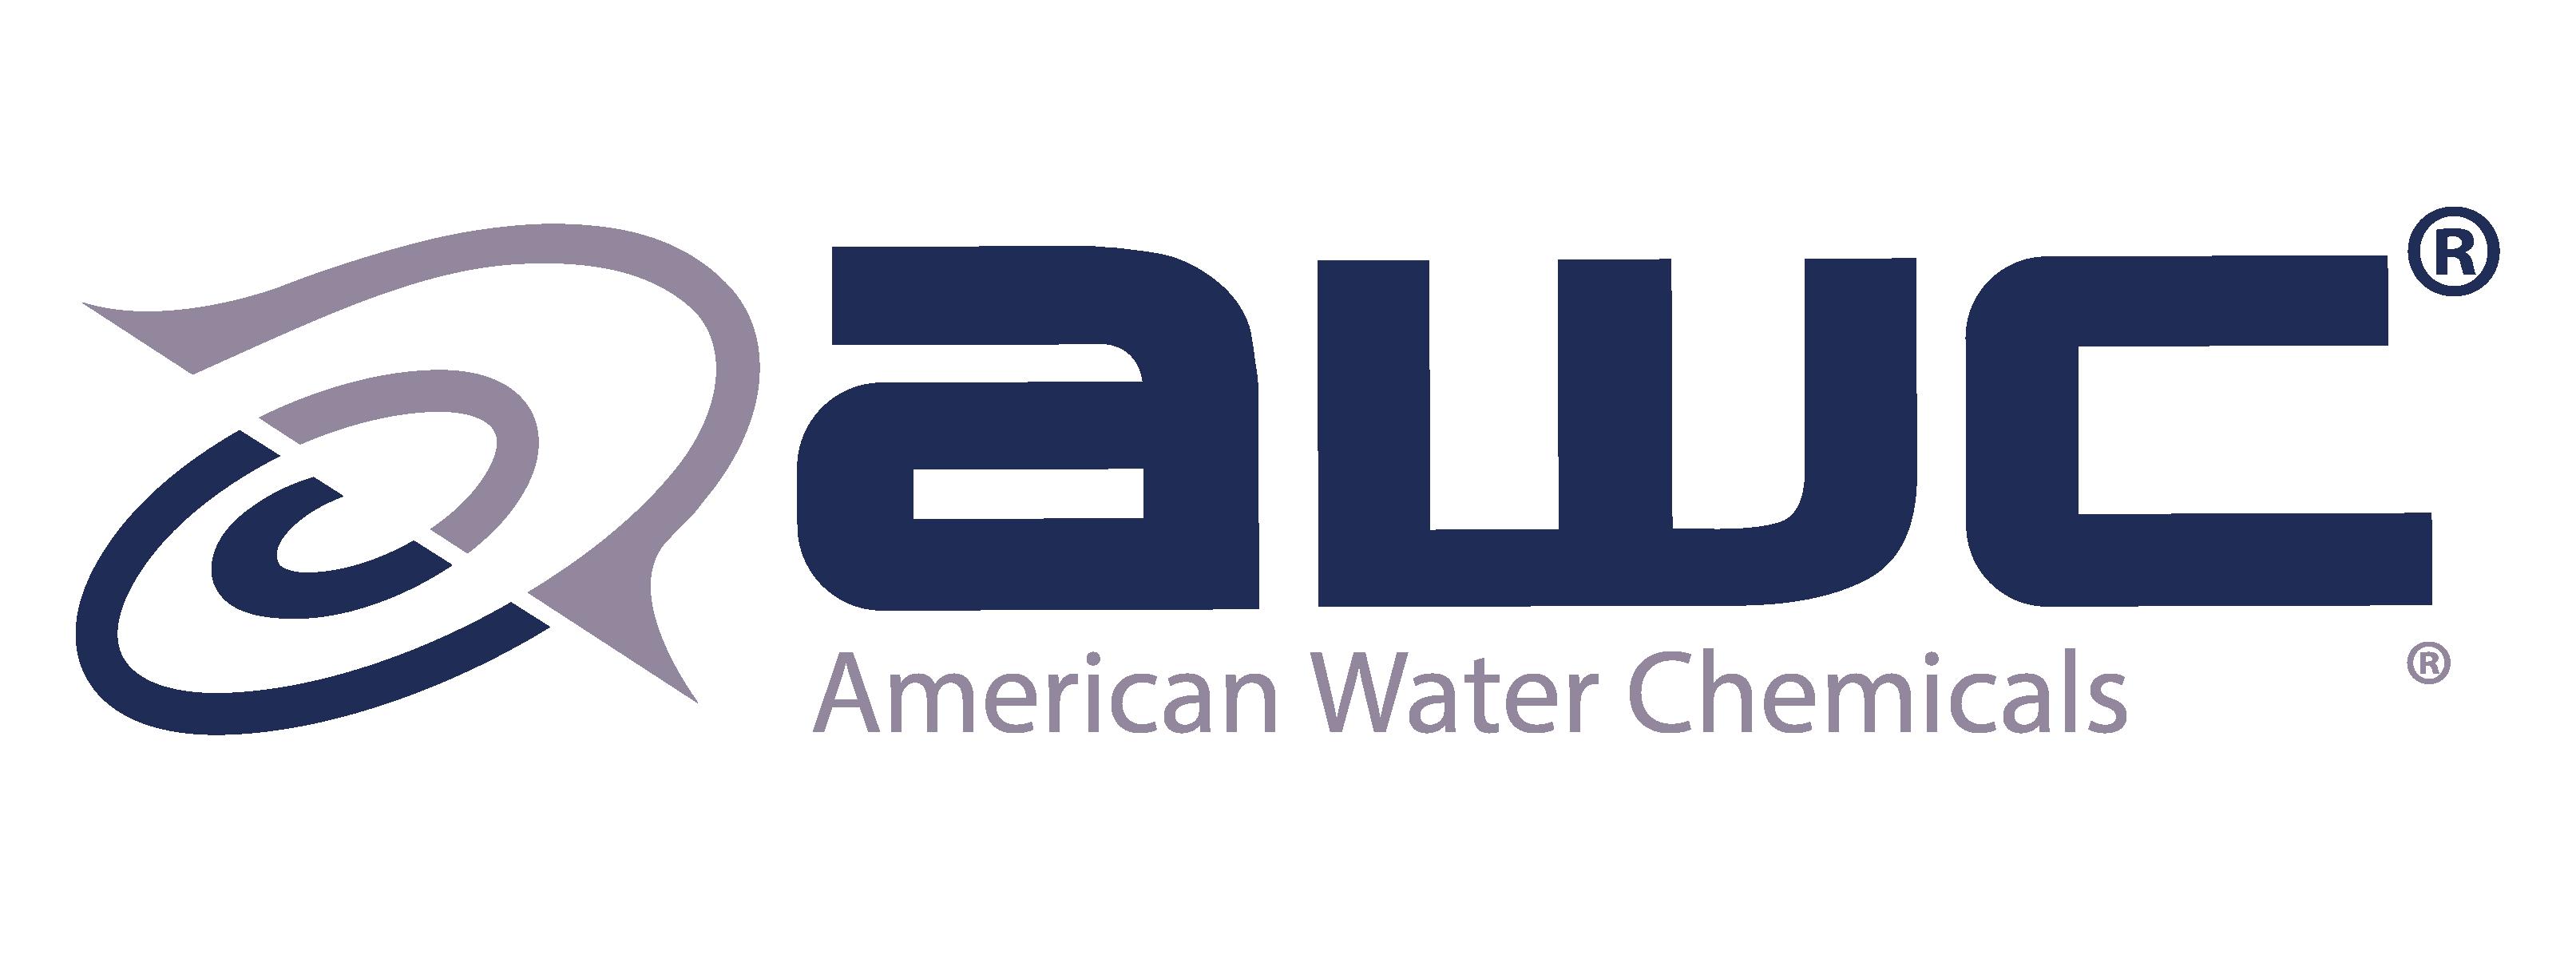 Awc logo png